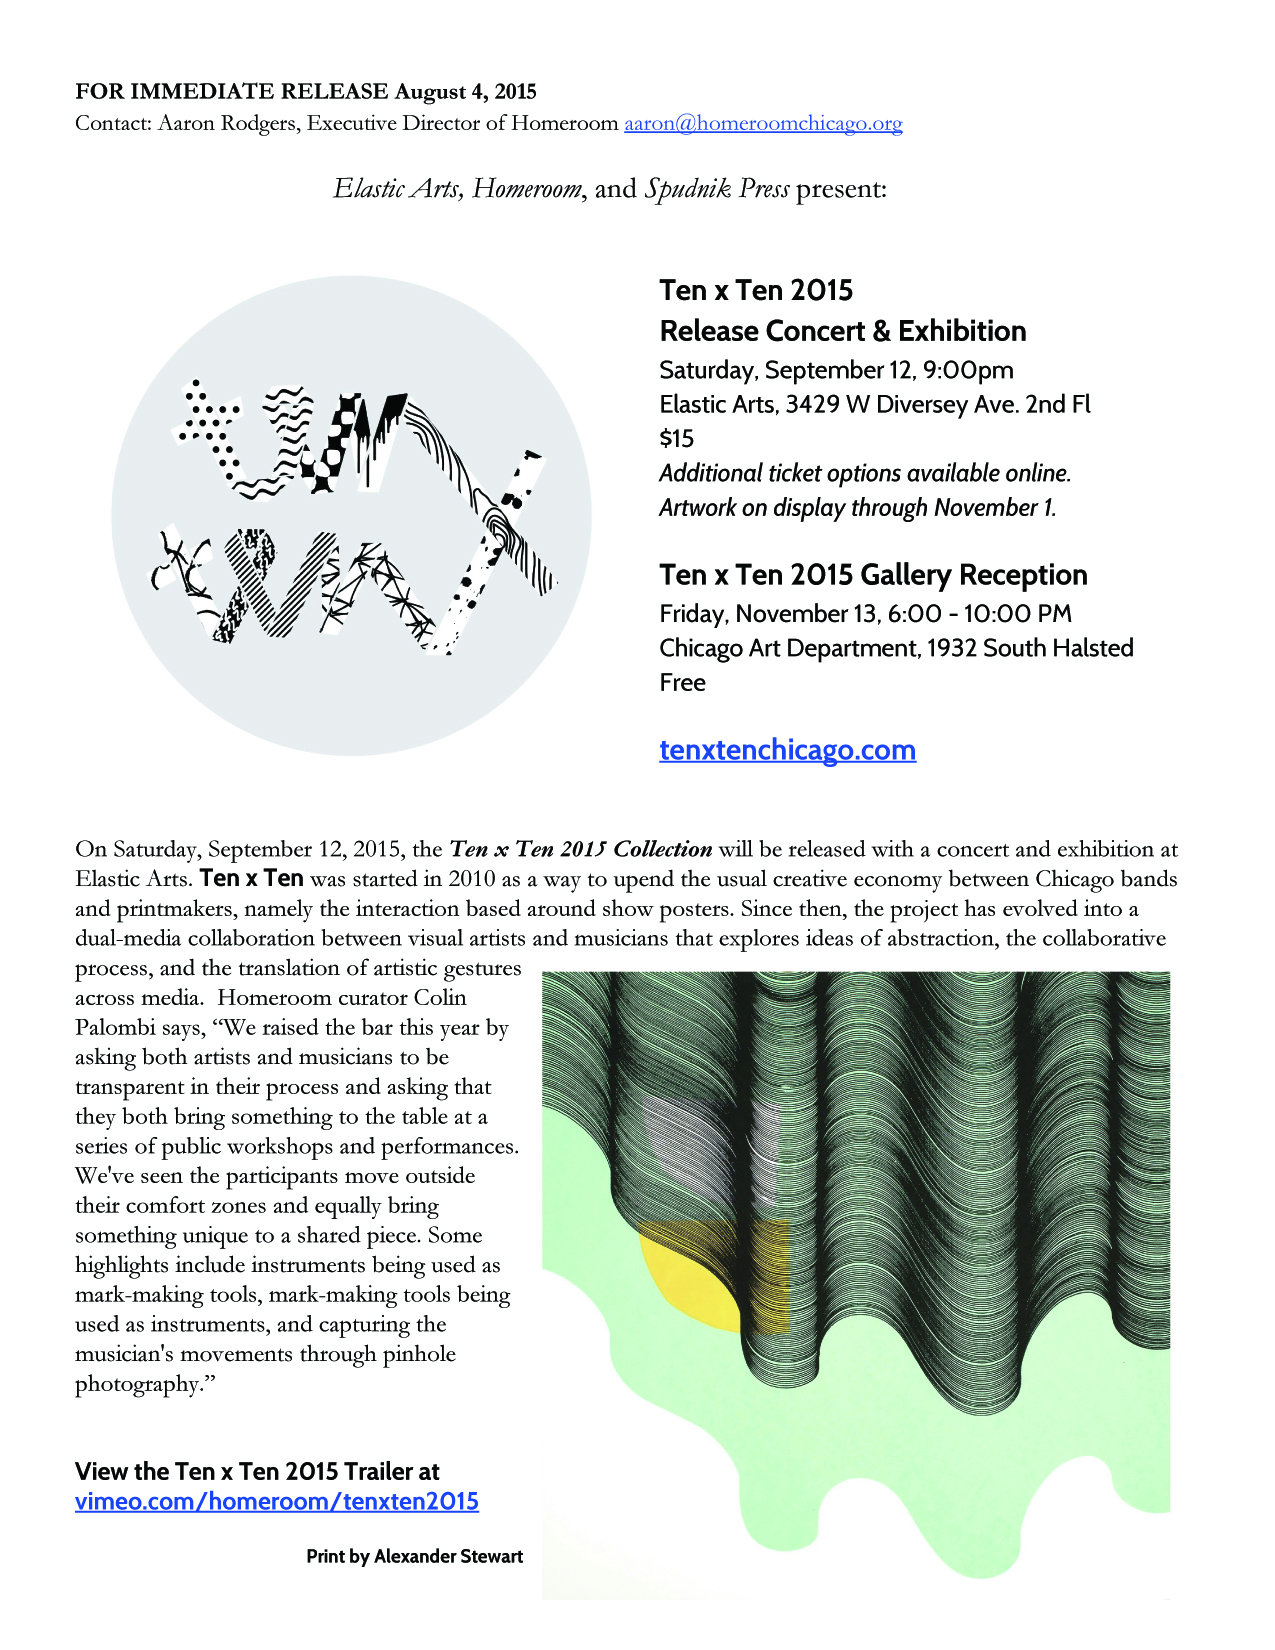 Ten x Ten 2015 Press Release 1/5